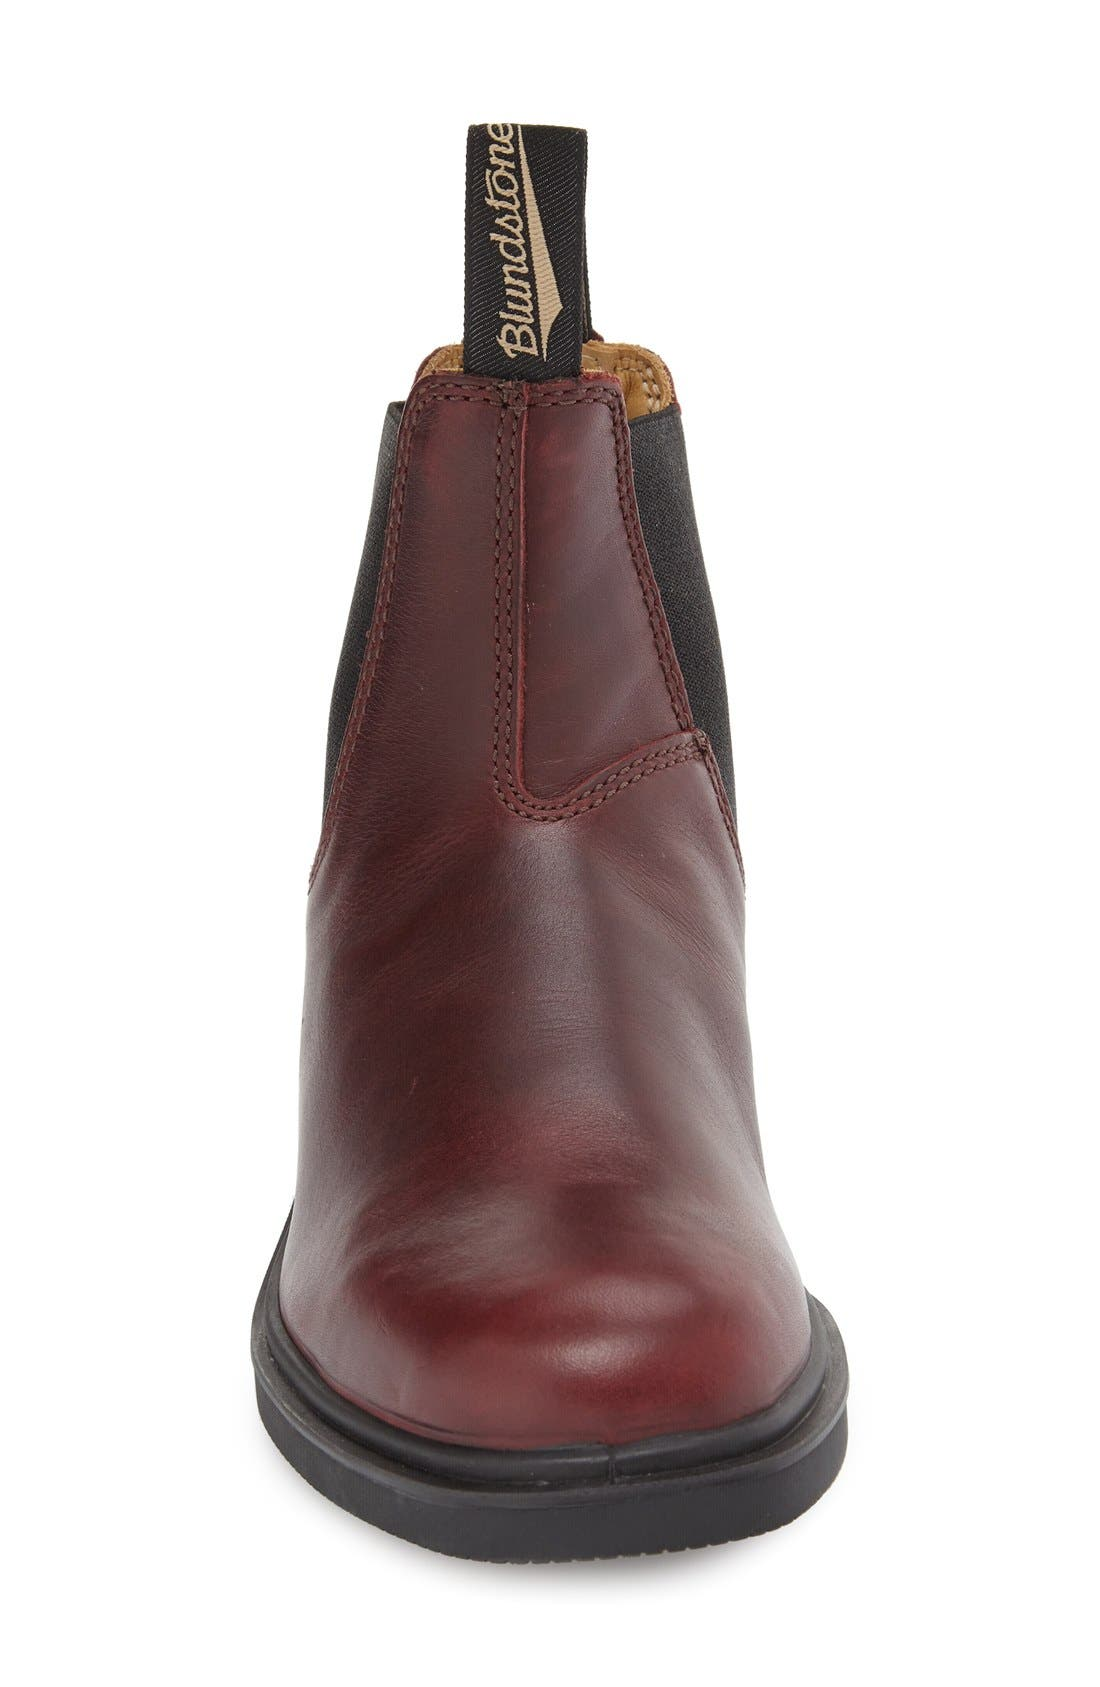 Footwear 'Original - 500 Series' Water Resistant Chelsea Boot,                             Alternate thumbnail 6, color,